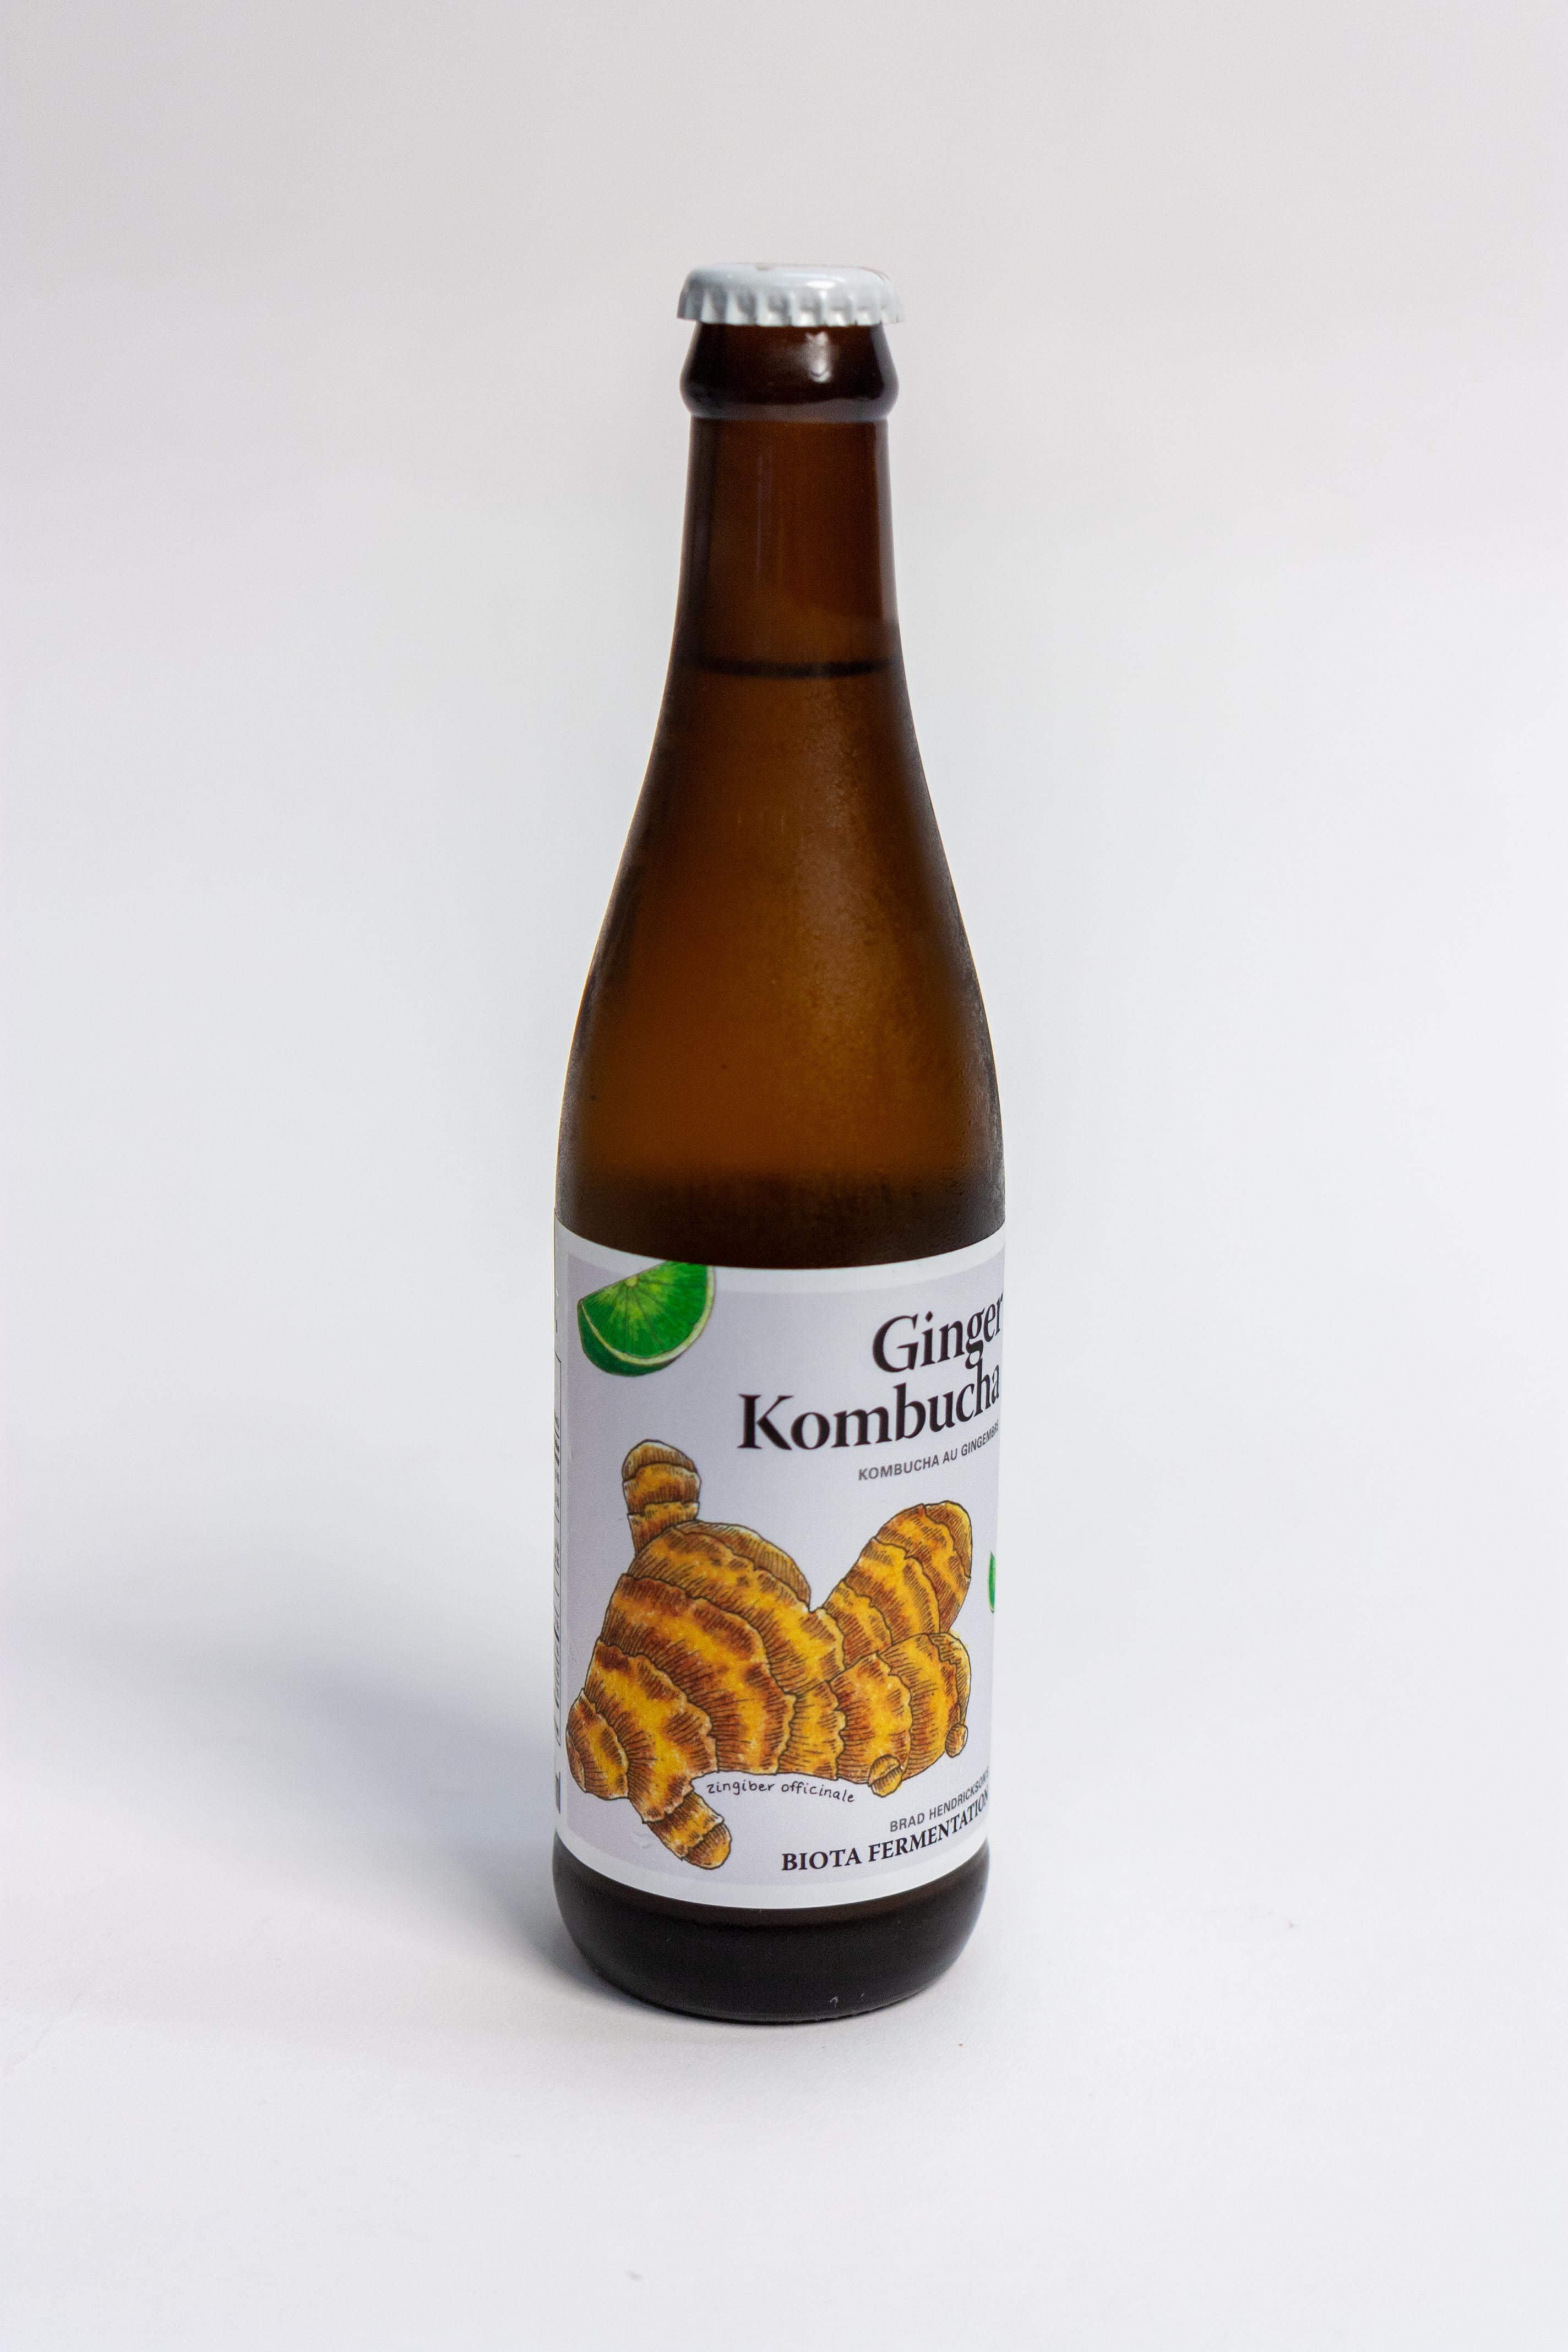 Ginger Kombucha bottle with ginger illustration on lavender background — by Yagnyuk.